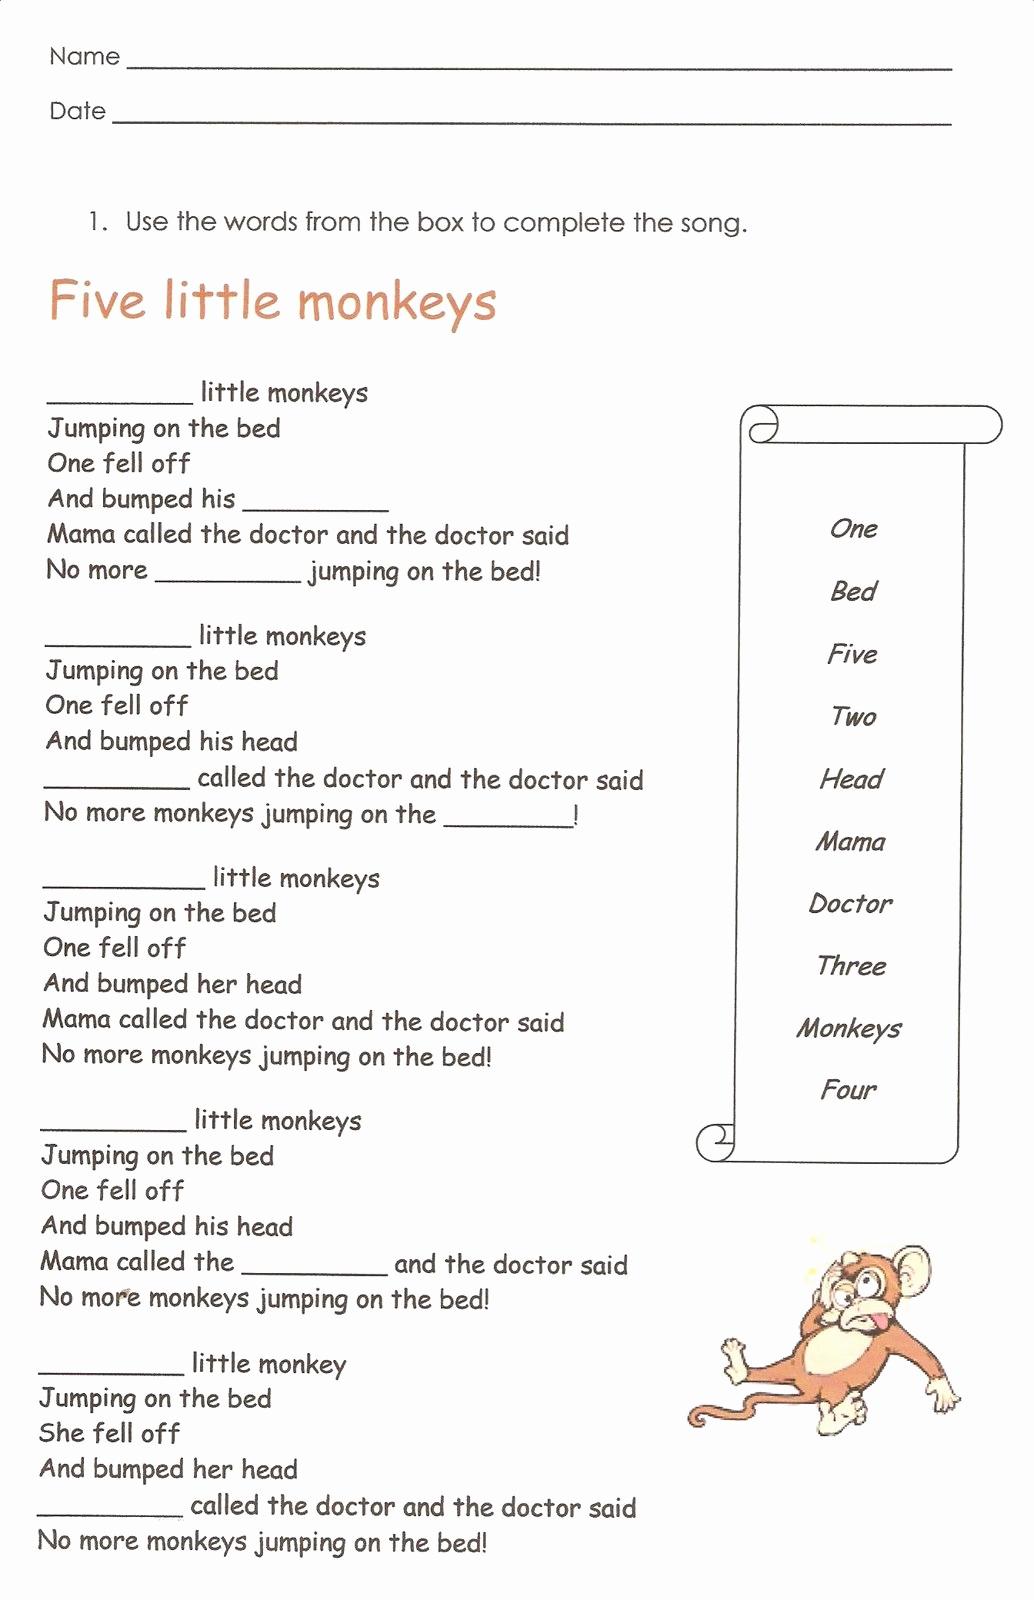 Grammar Worksheet 1st Grade Lovely First Grade English Worksheets to Print